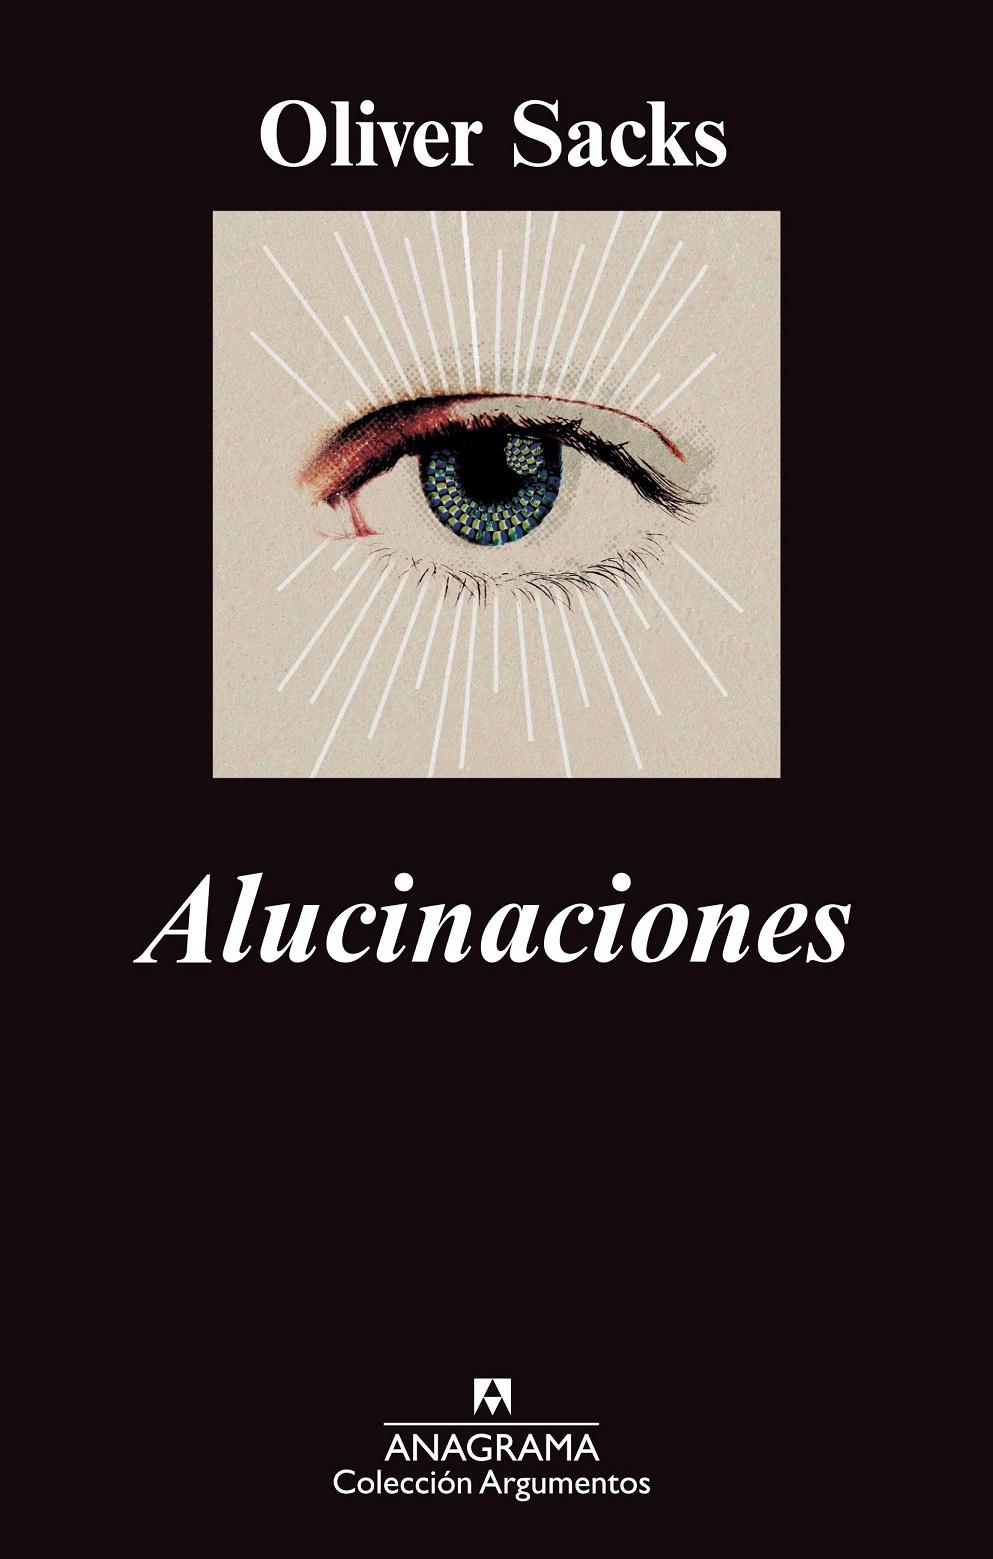 http://laantiguabiblos.blogspot.com.es/2016/08/alucinaciones-oliver-sacks.html